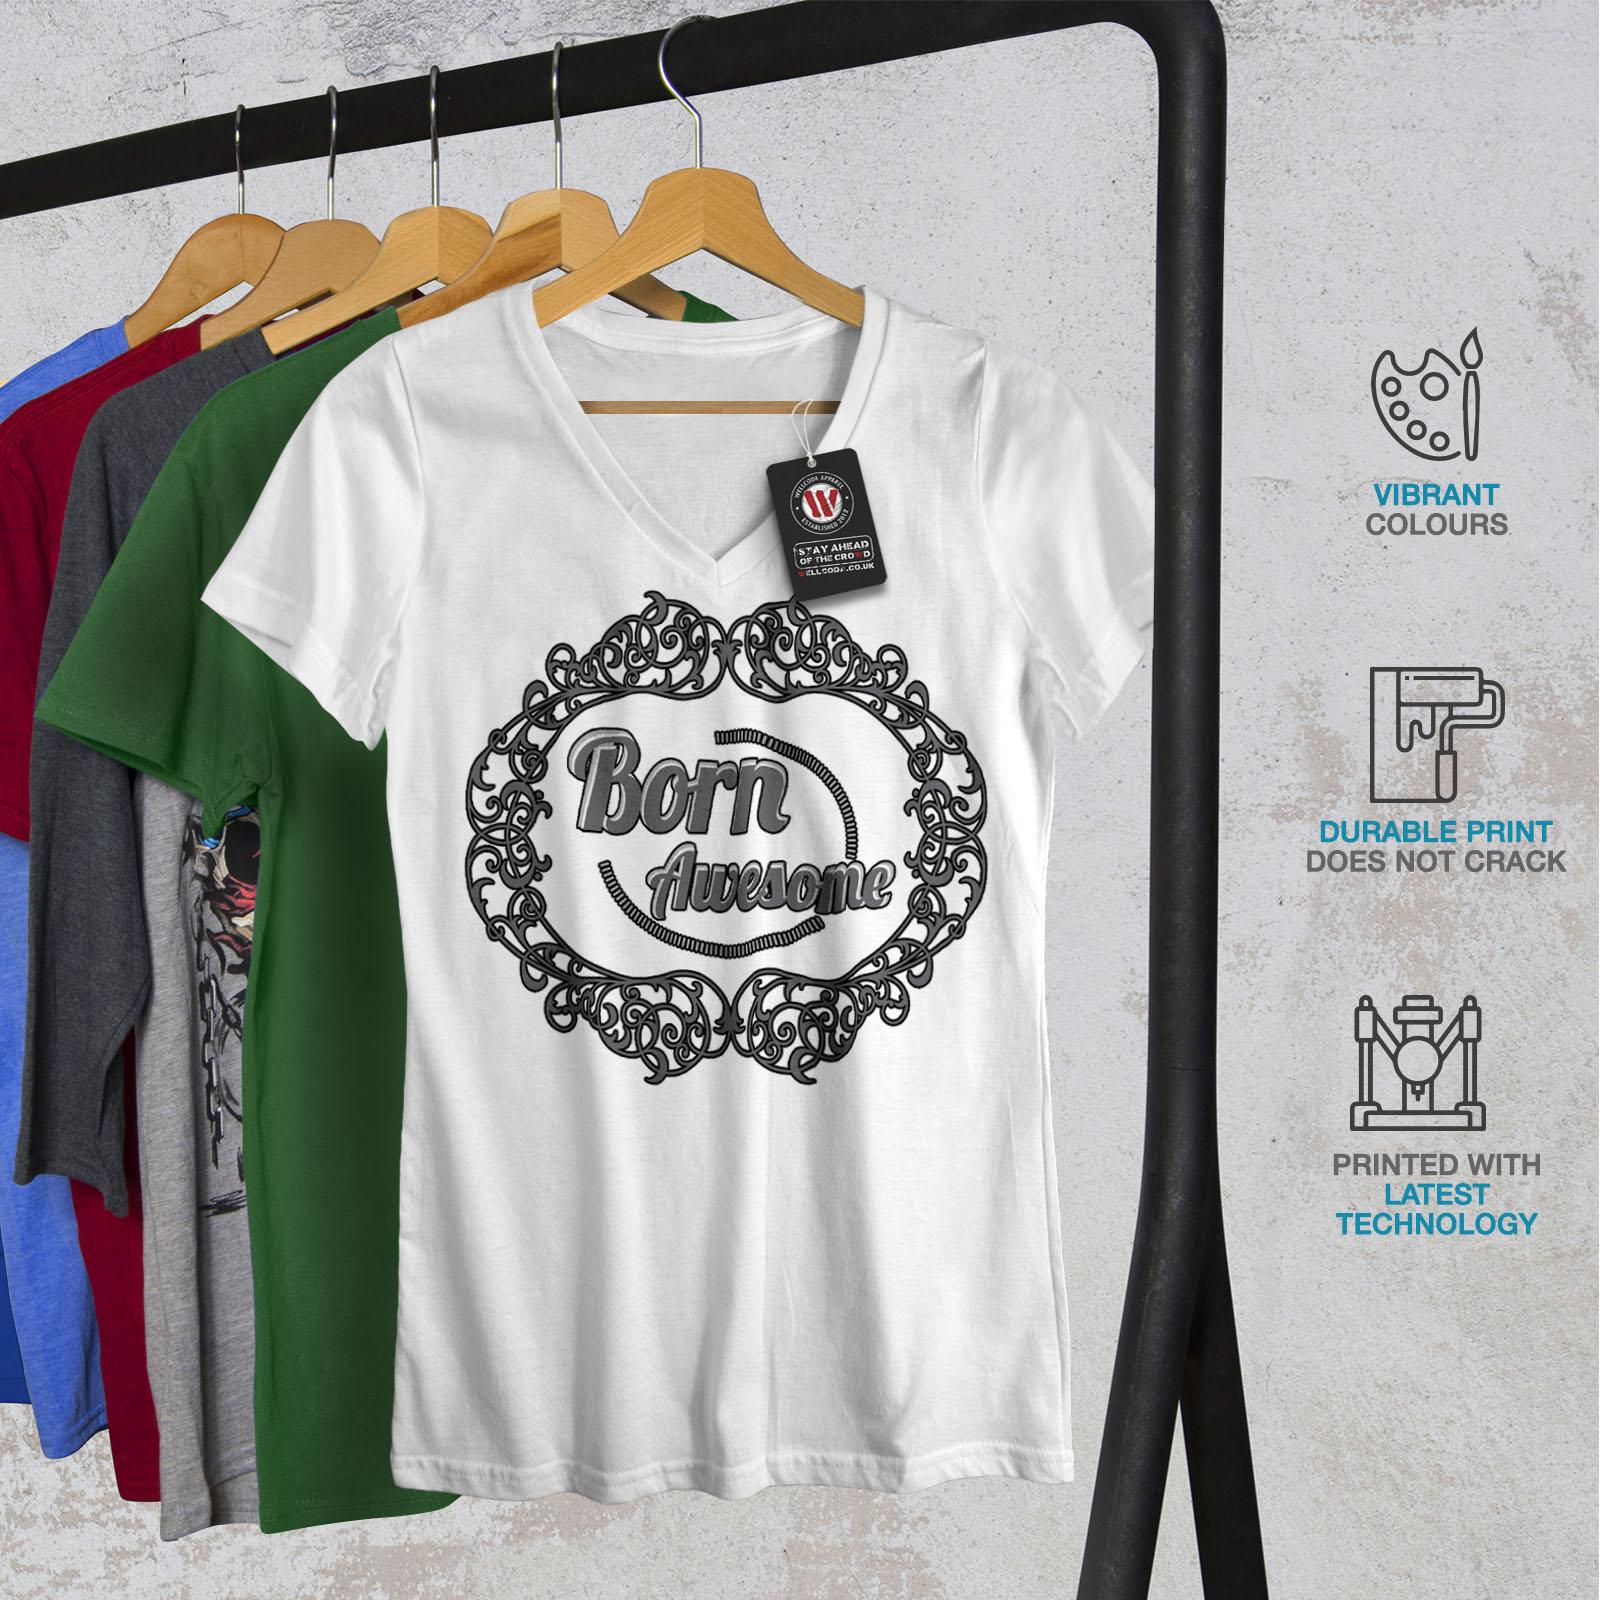 Crazy Active Sports Shirt Wellcoda Born Awsome Cool Slogan Mens Tank Top